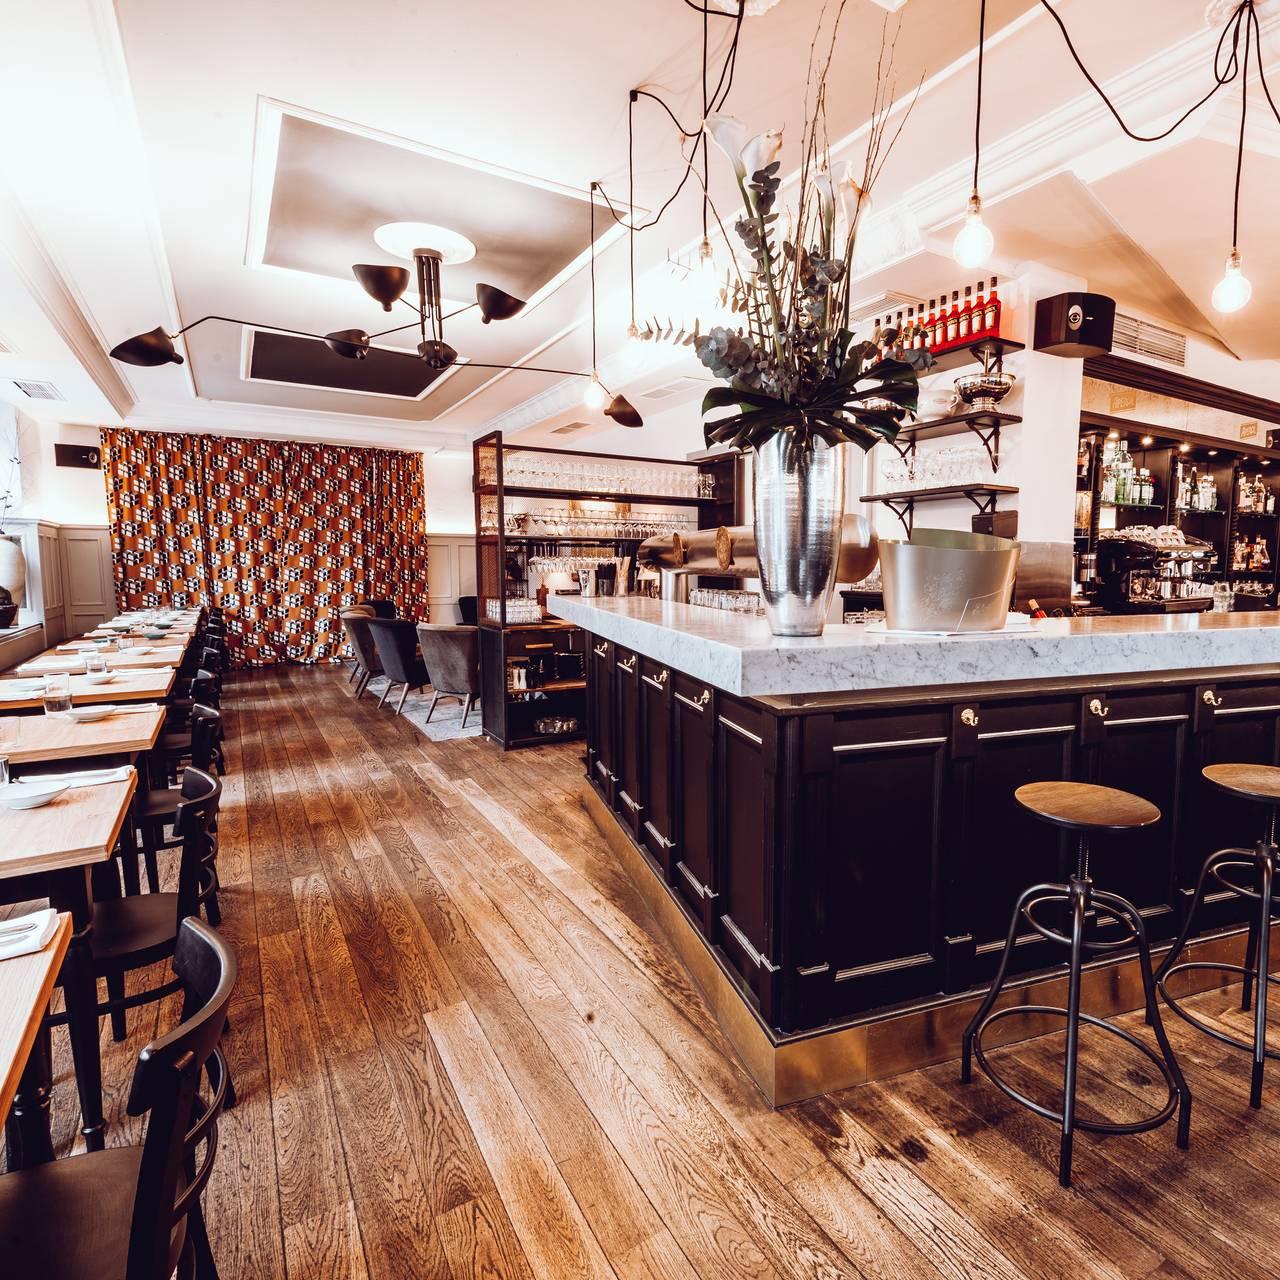 Cucina Corleone Restaurant - München, BY | OpenTable